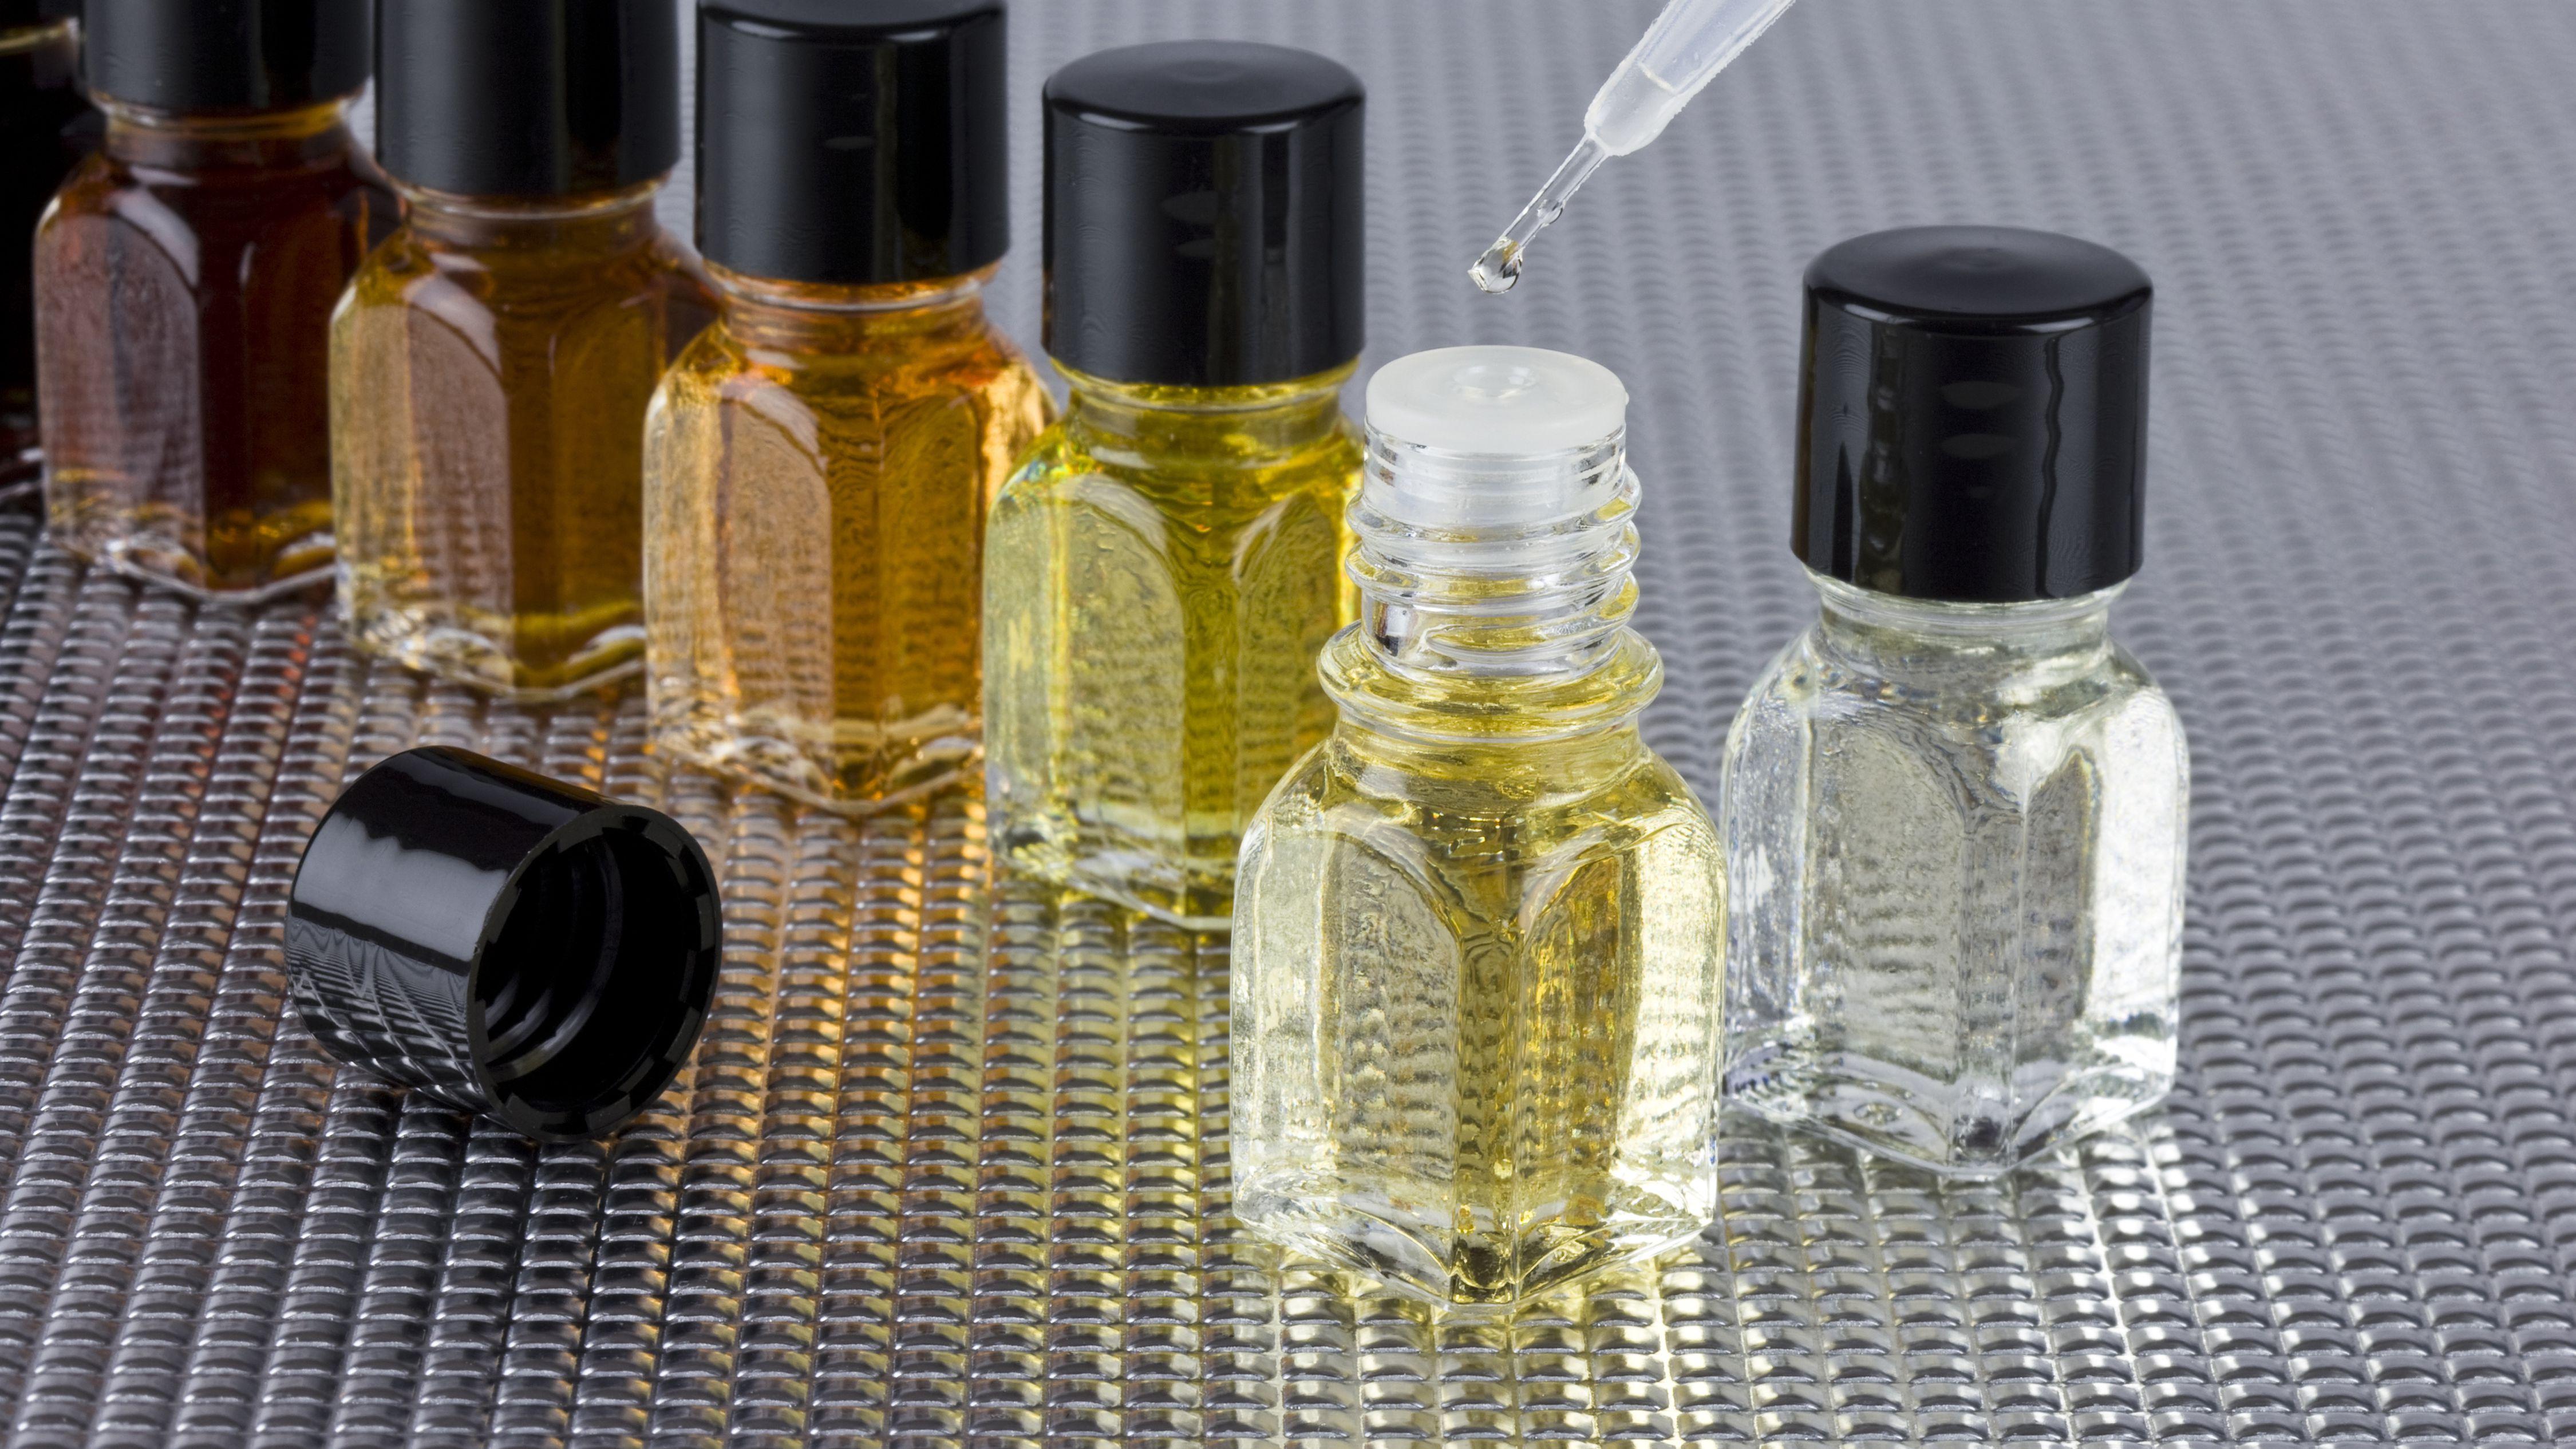 Urban Legend Of The Drugged Perfume